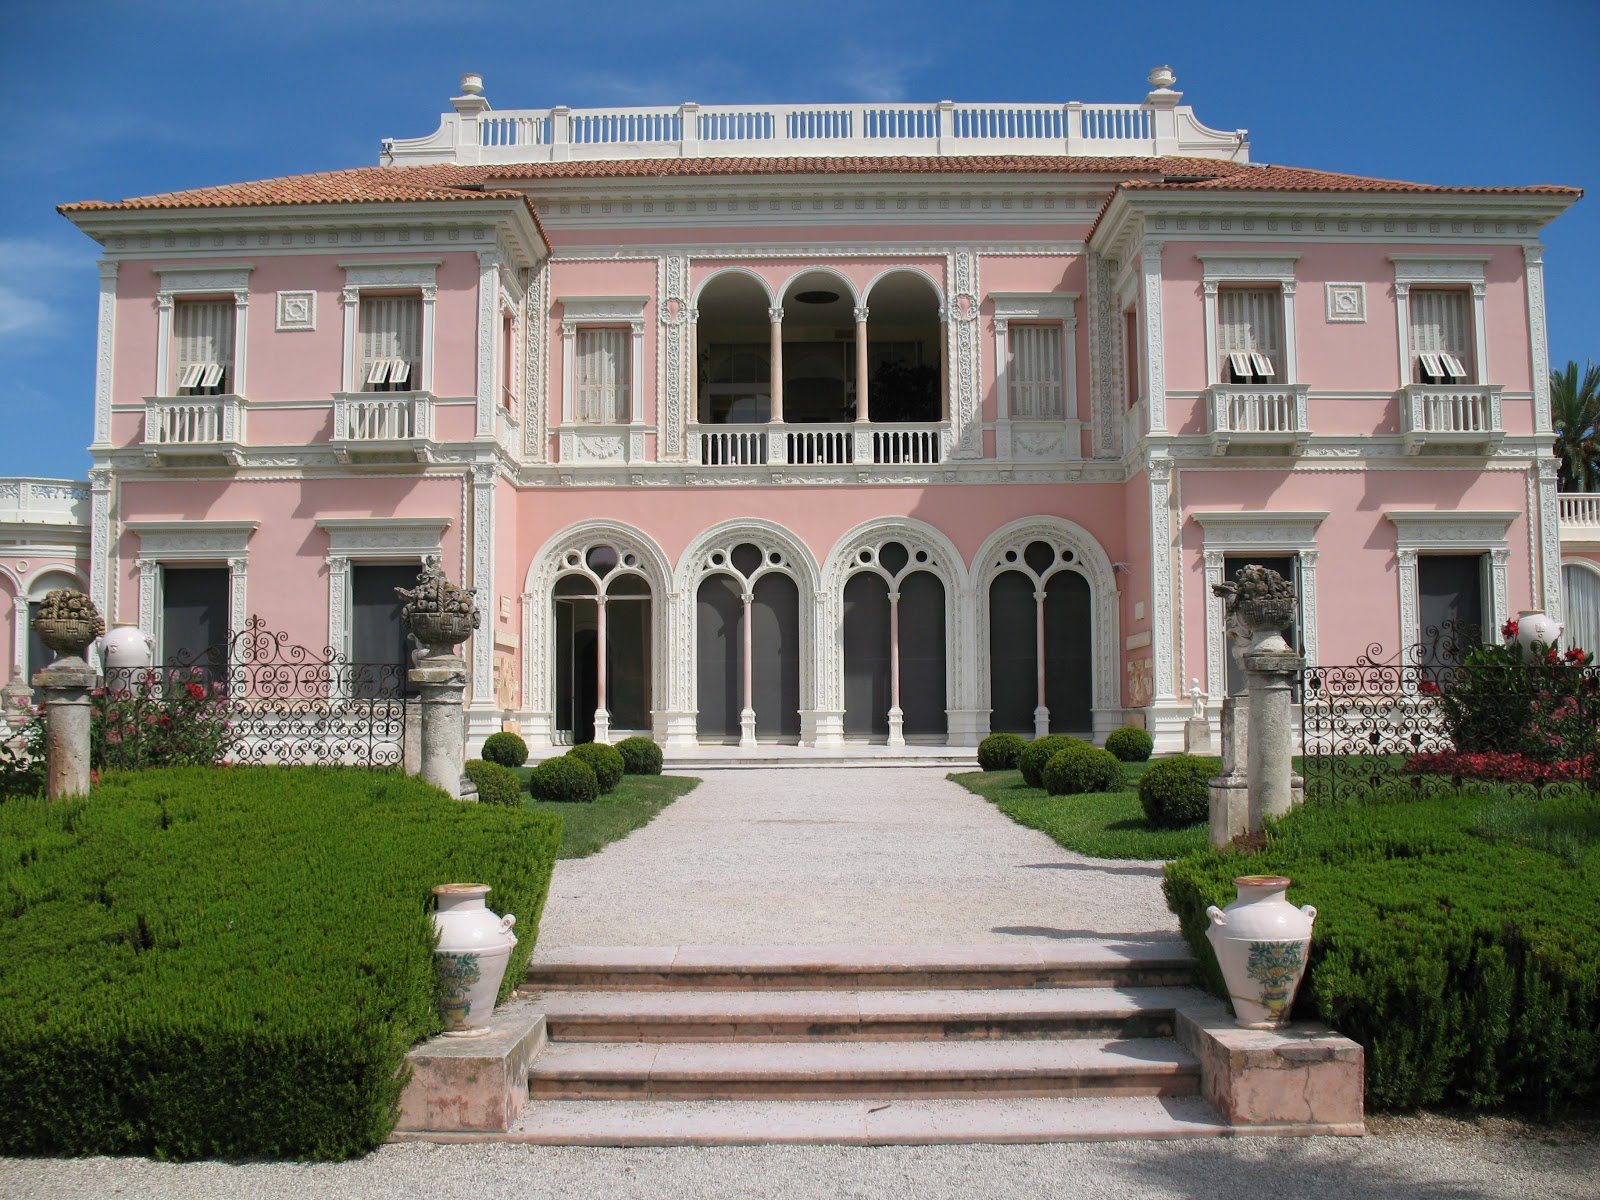 Roses du jardin ch neland villa ephrussi de rothschild - Jardins ephrussi de rothschild ...